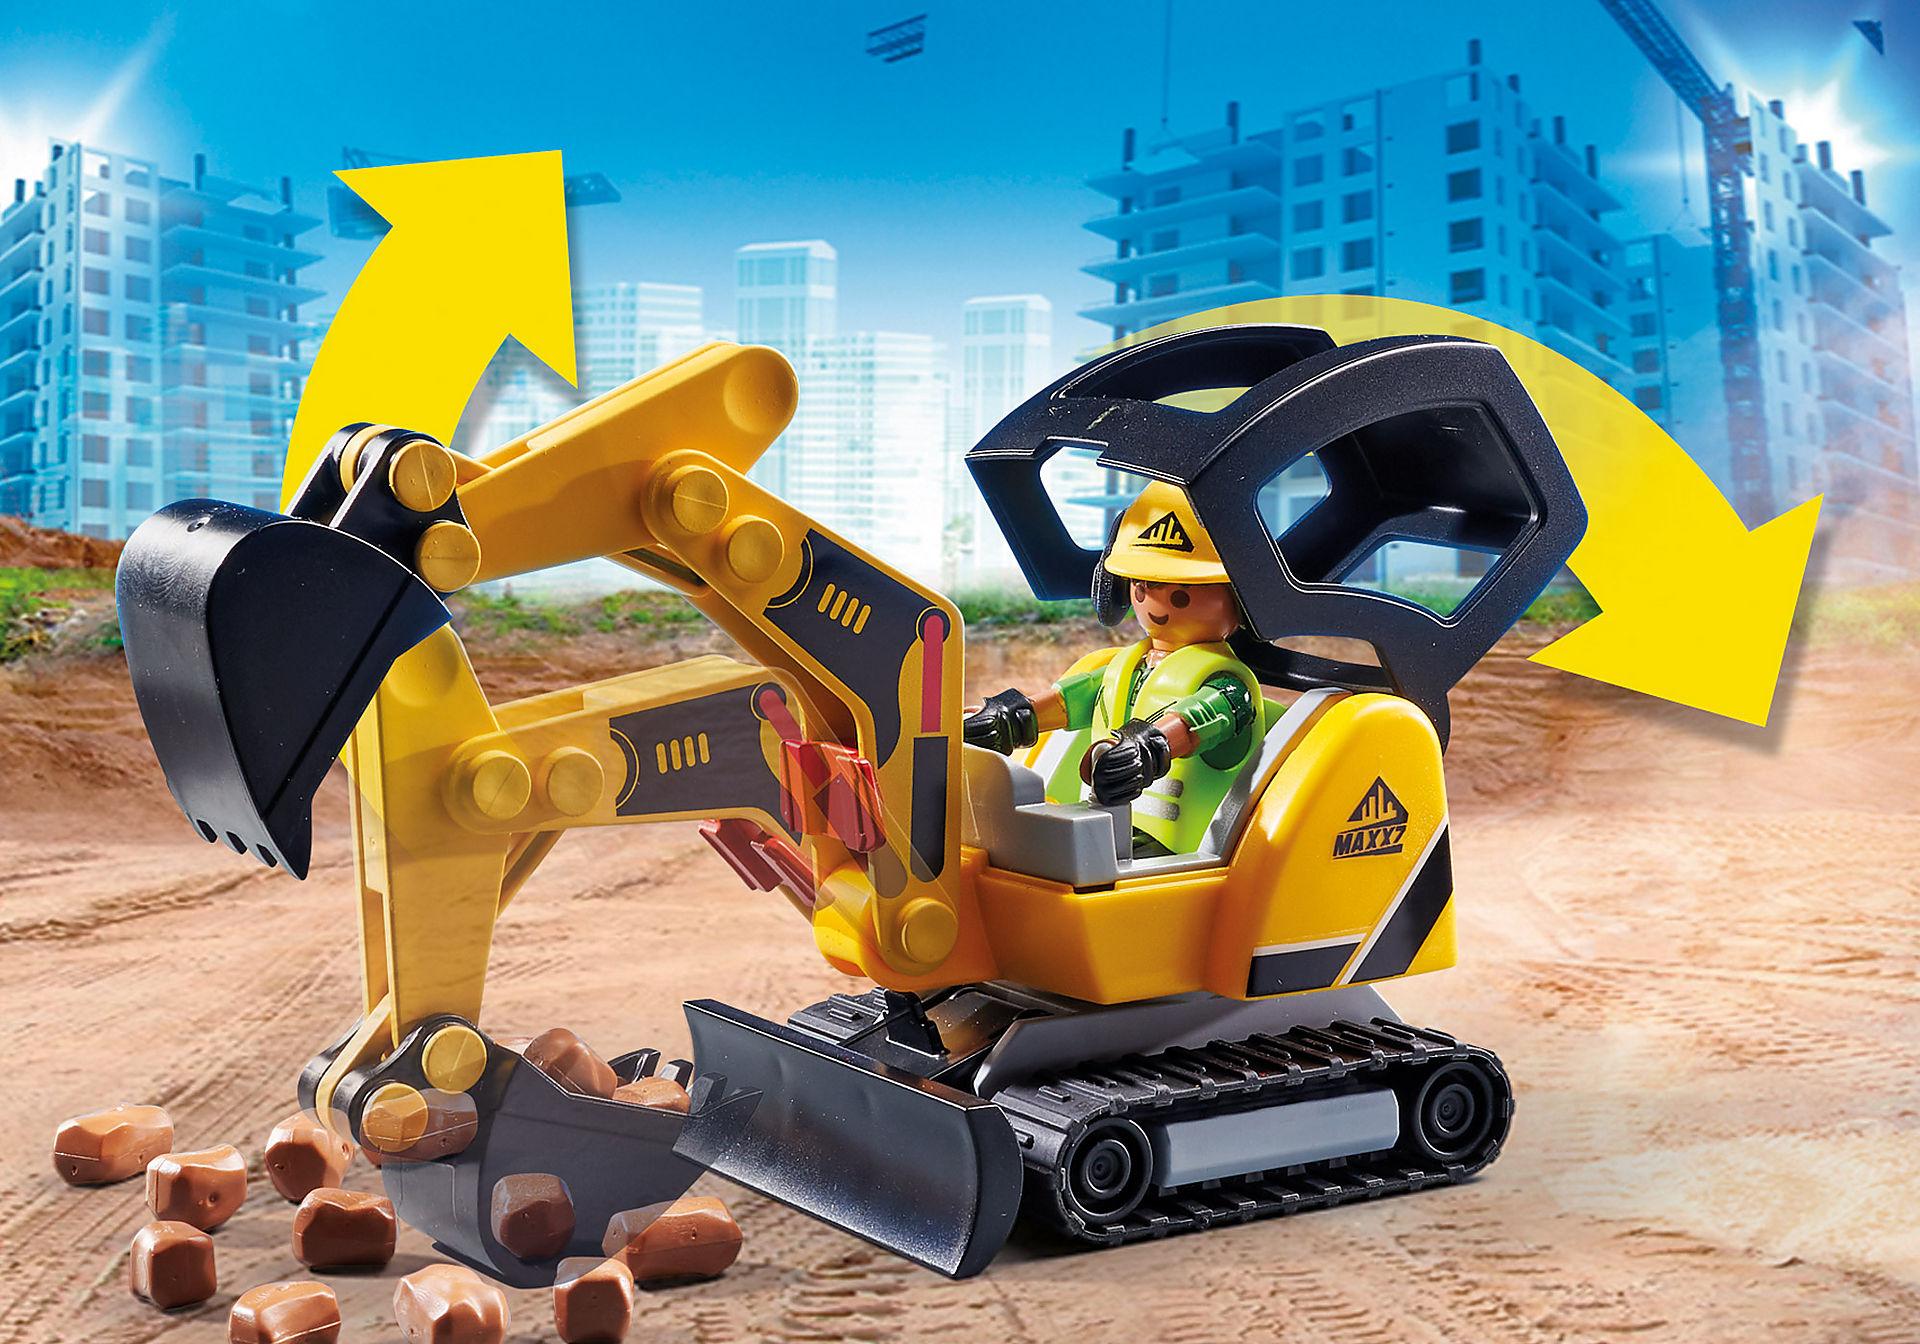 70443 Minibagger mit Bauteil zoom image5